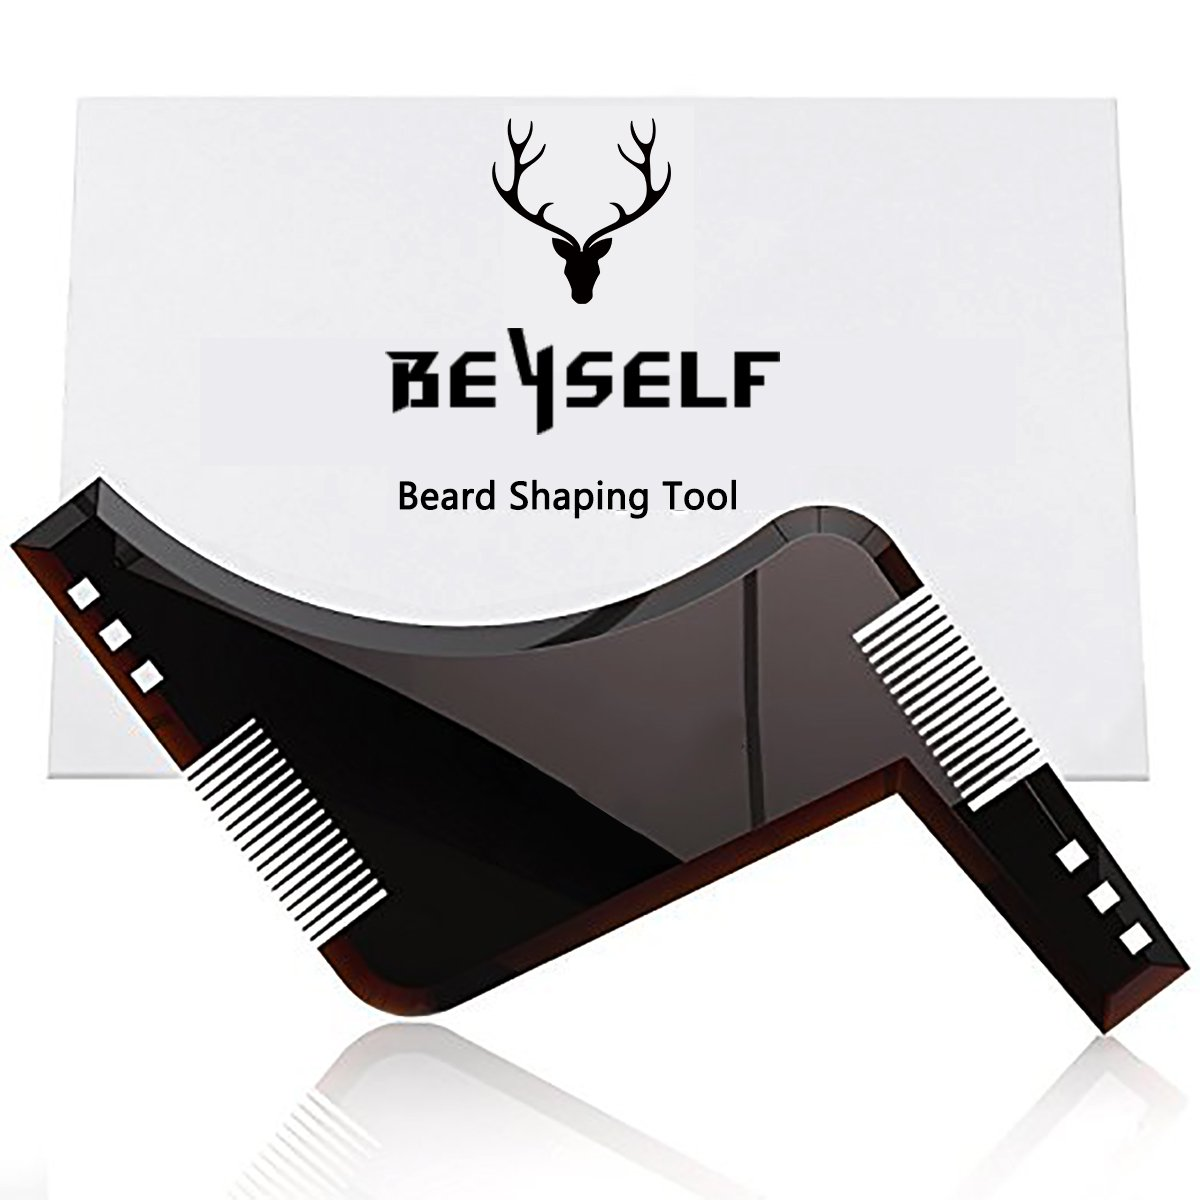 Peigne pochoir barbe homme, BeYself Beard Shaping Template Tool & Beard Comb, qualité supérieure Beard Shaper